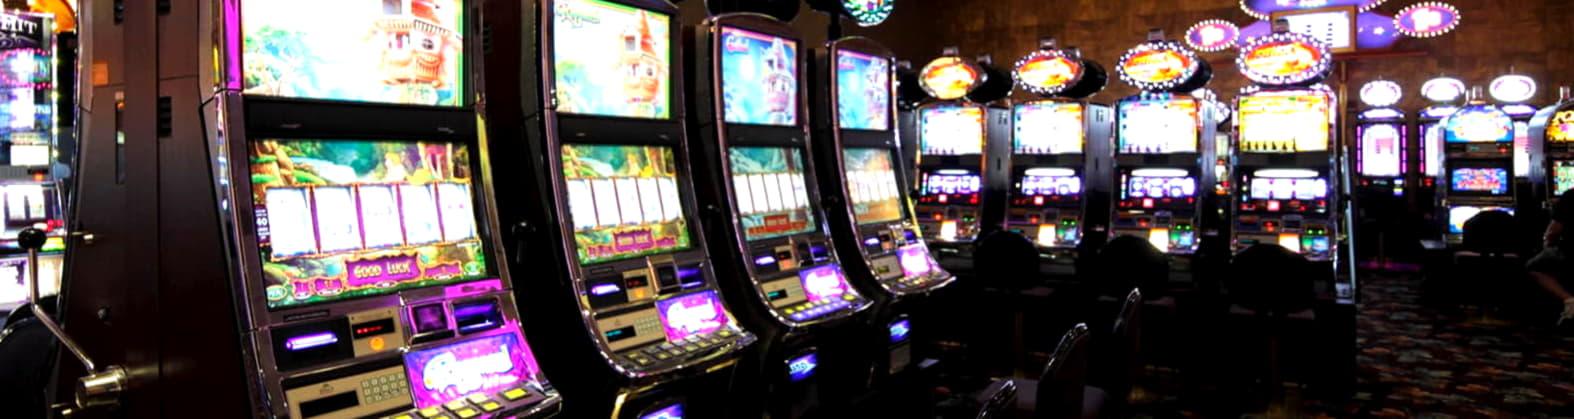 €560 FREE Casino Chip at Slots Billion Casino